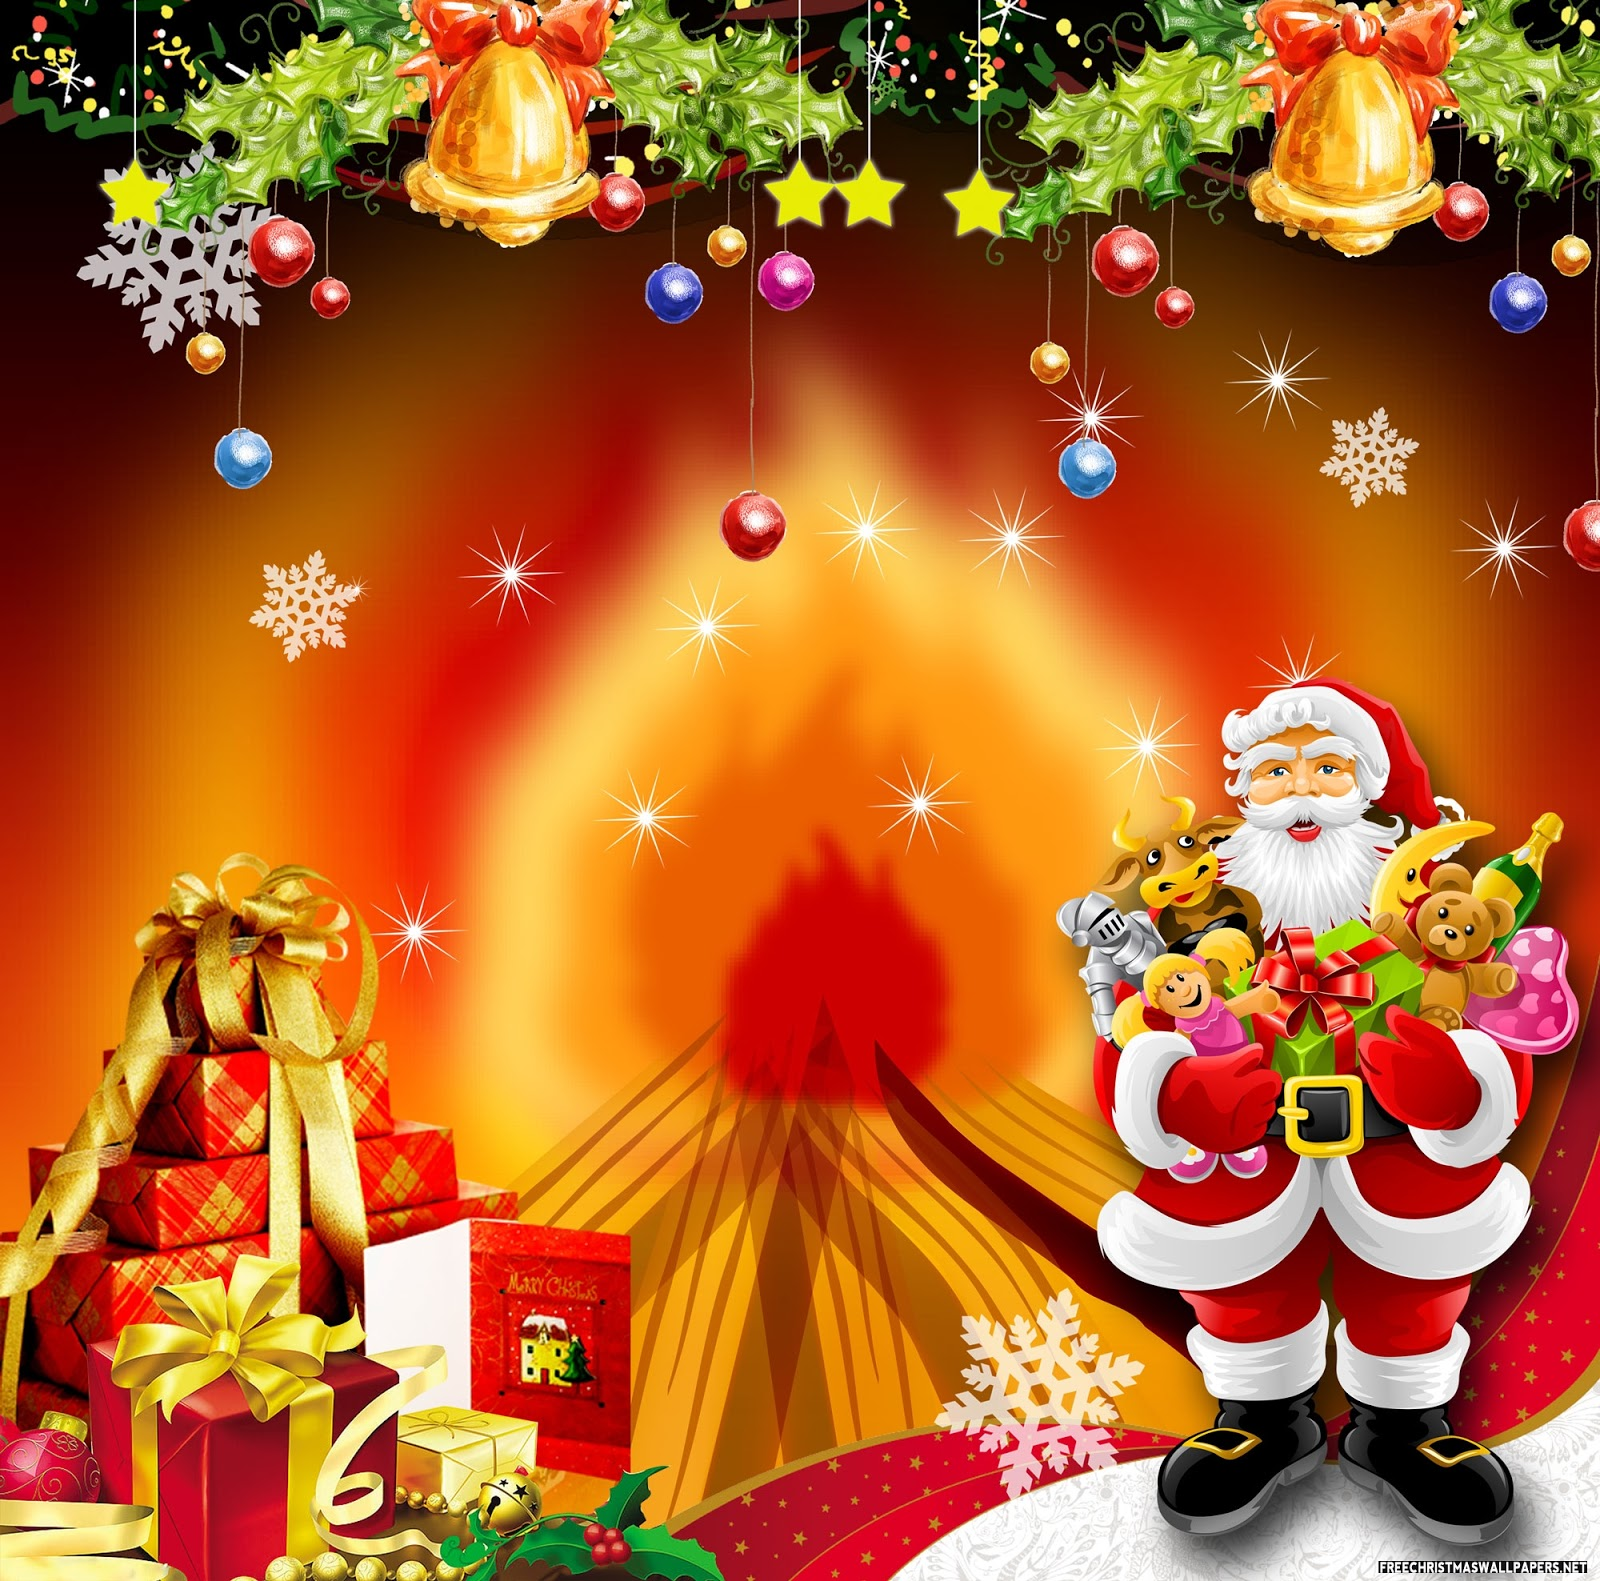 Download HD Christmas & New Year 2017 Bible Verse Greetings Card & Wa...